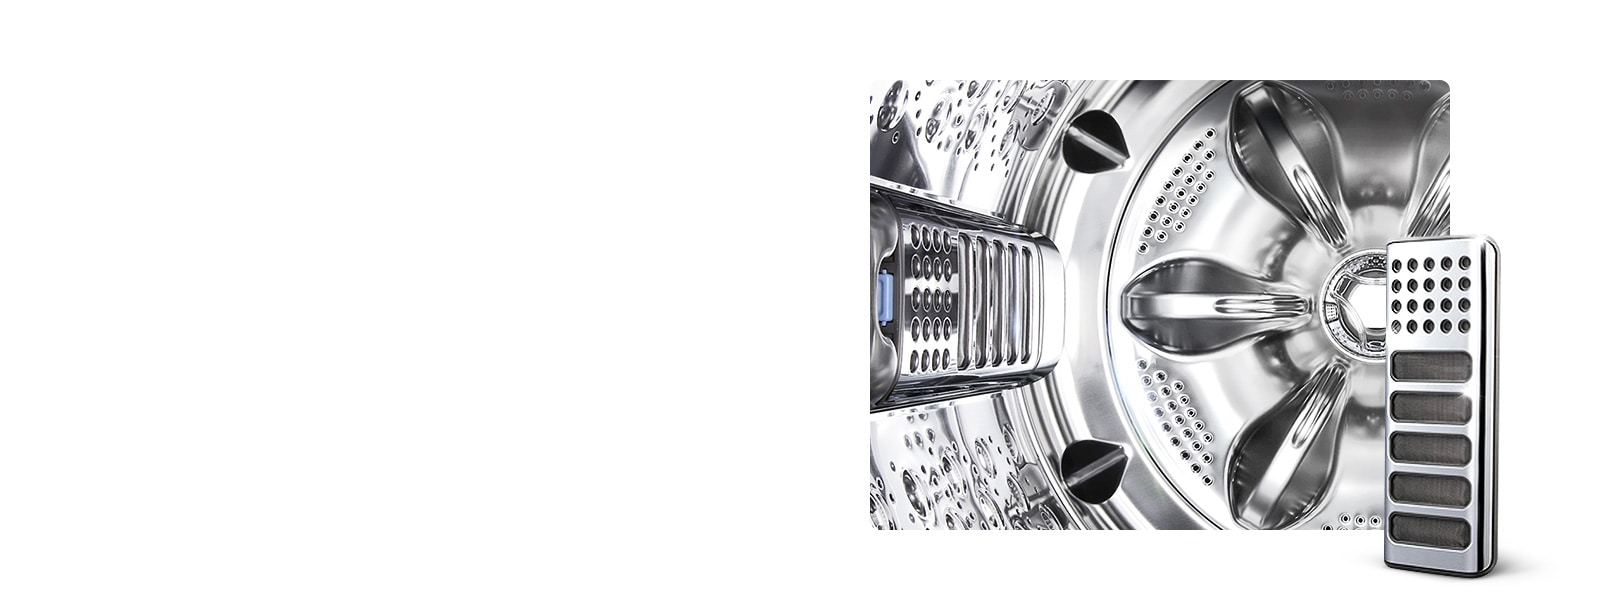 Full Stainless Steel Tub & Lint Filter1